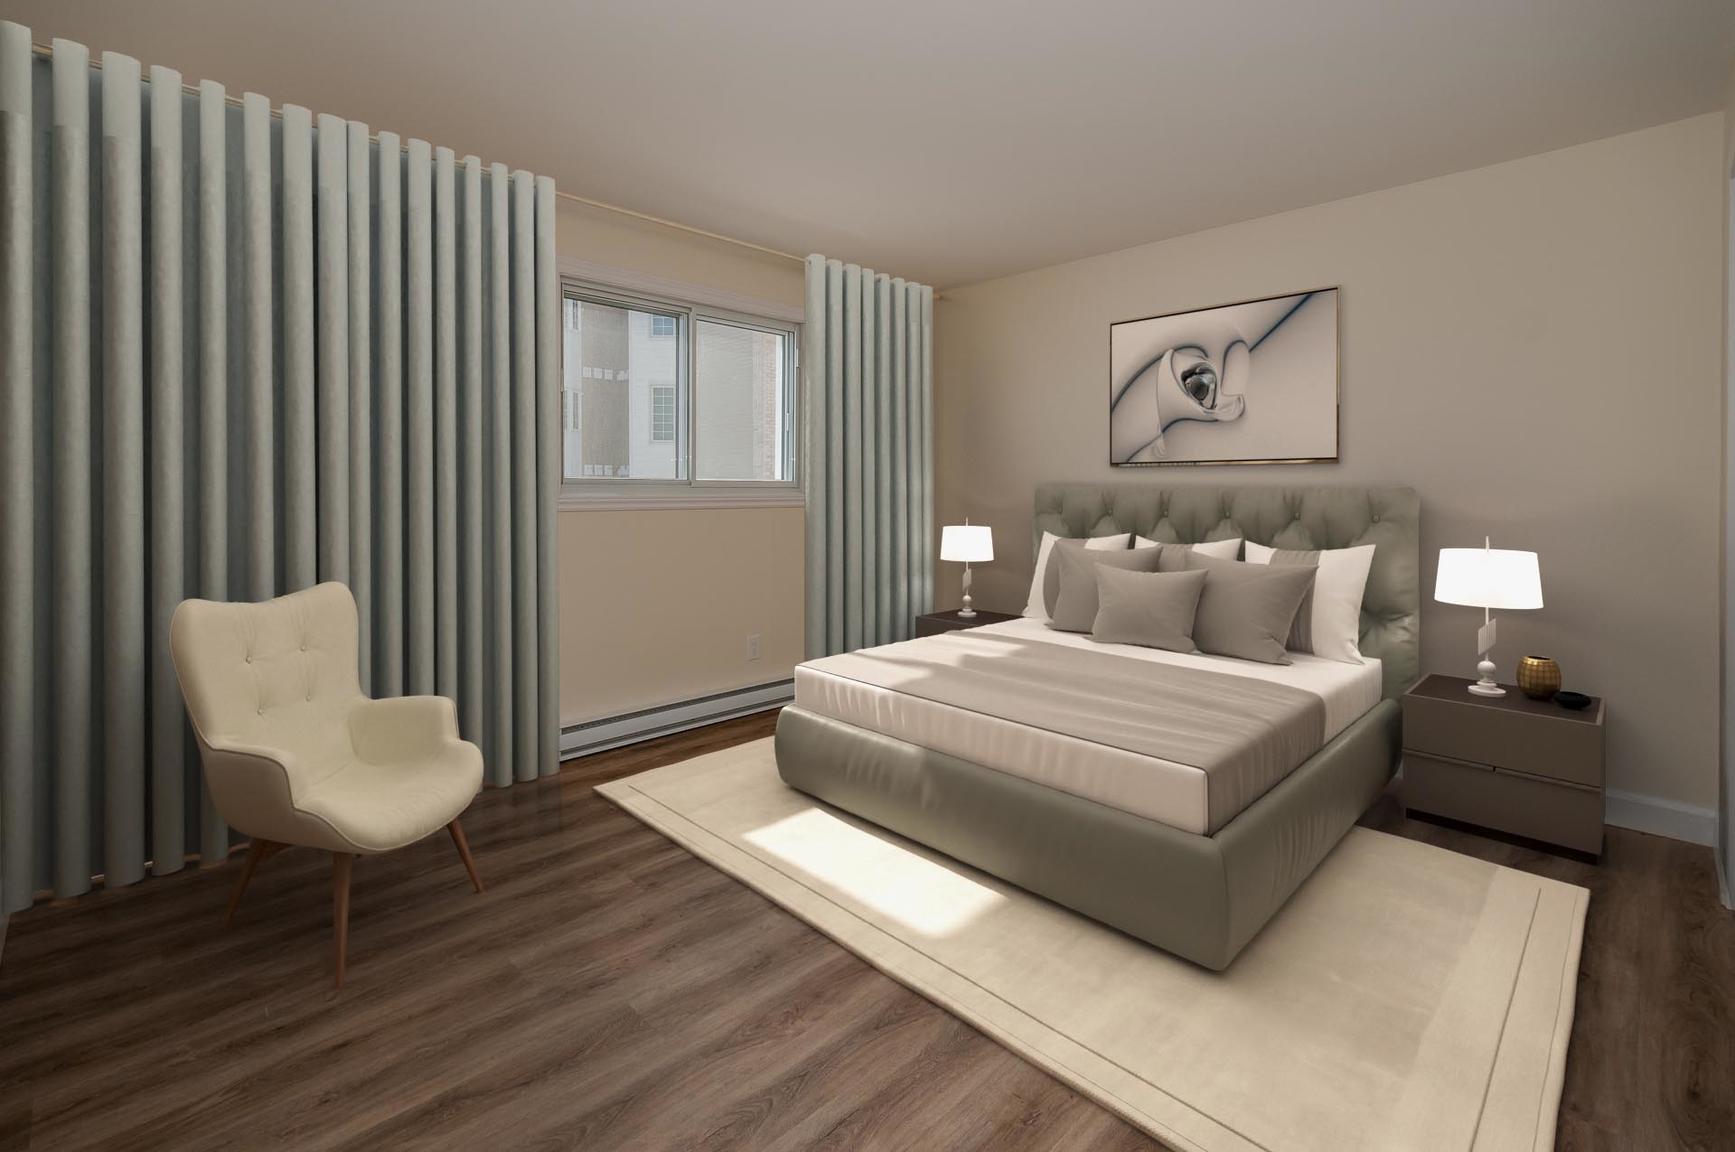 1 bedroom Apartments for rent in Quebec City at Les Appartements du Verdier - Photo 20 - RentQuebecApartments – L407122